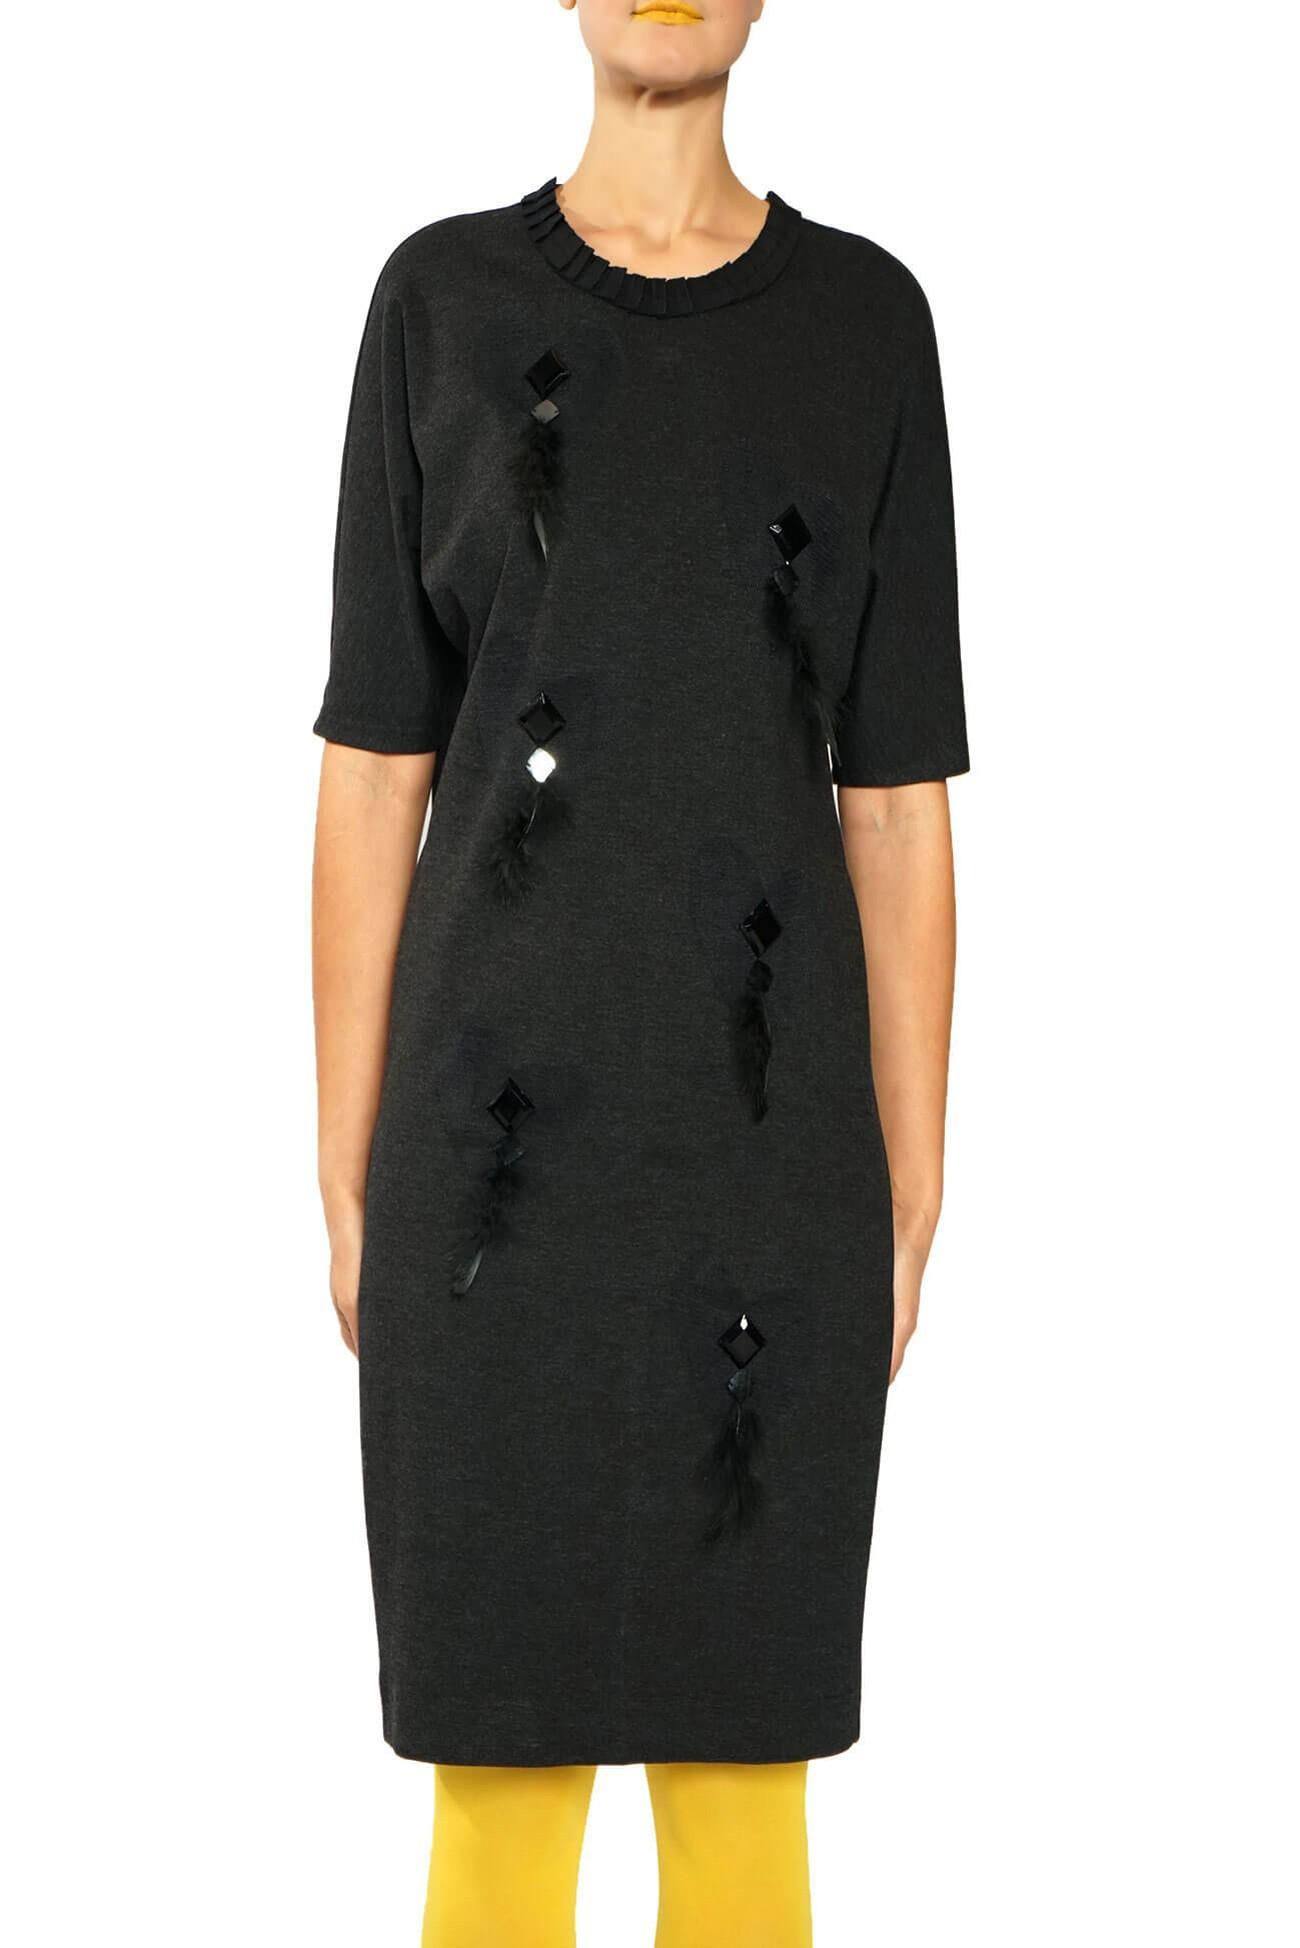 rochie chimono cu aplicatii din pene si strasuri